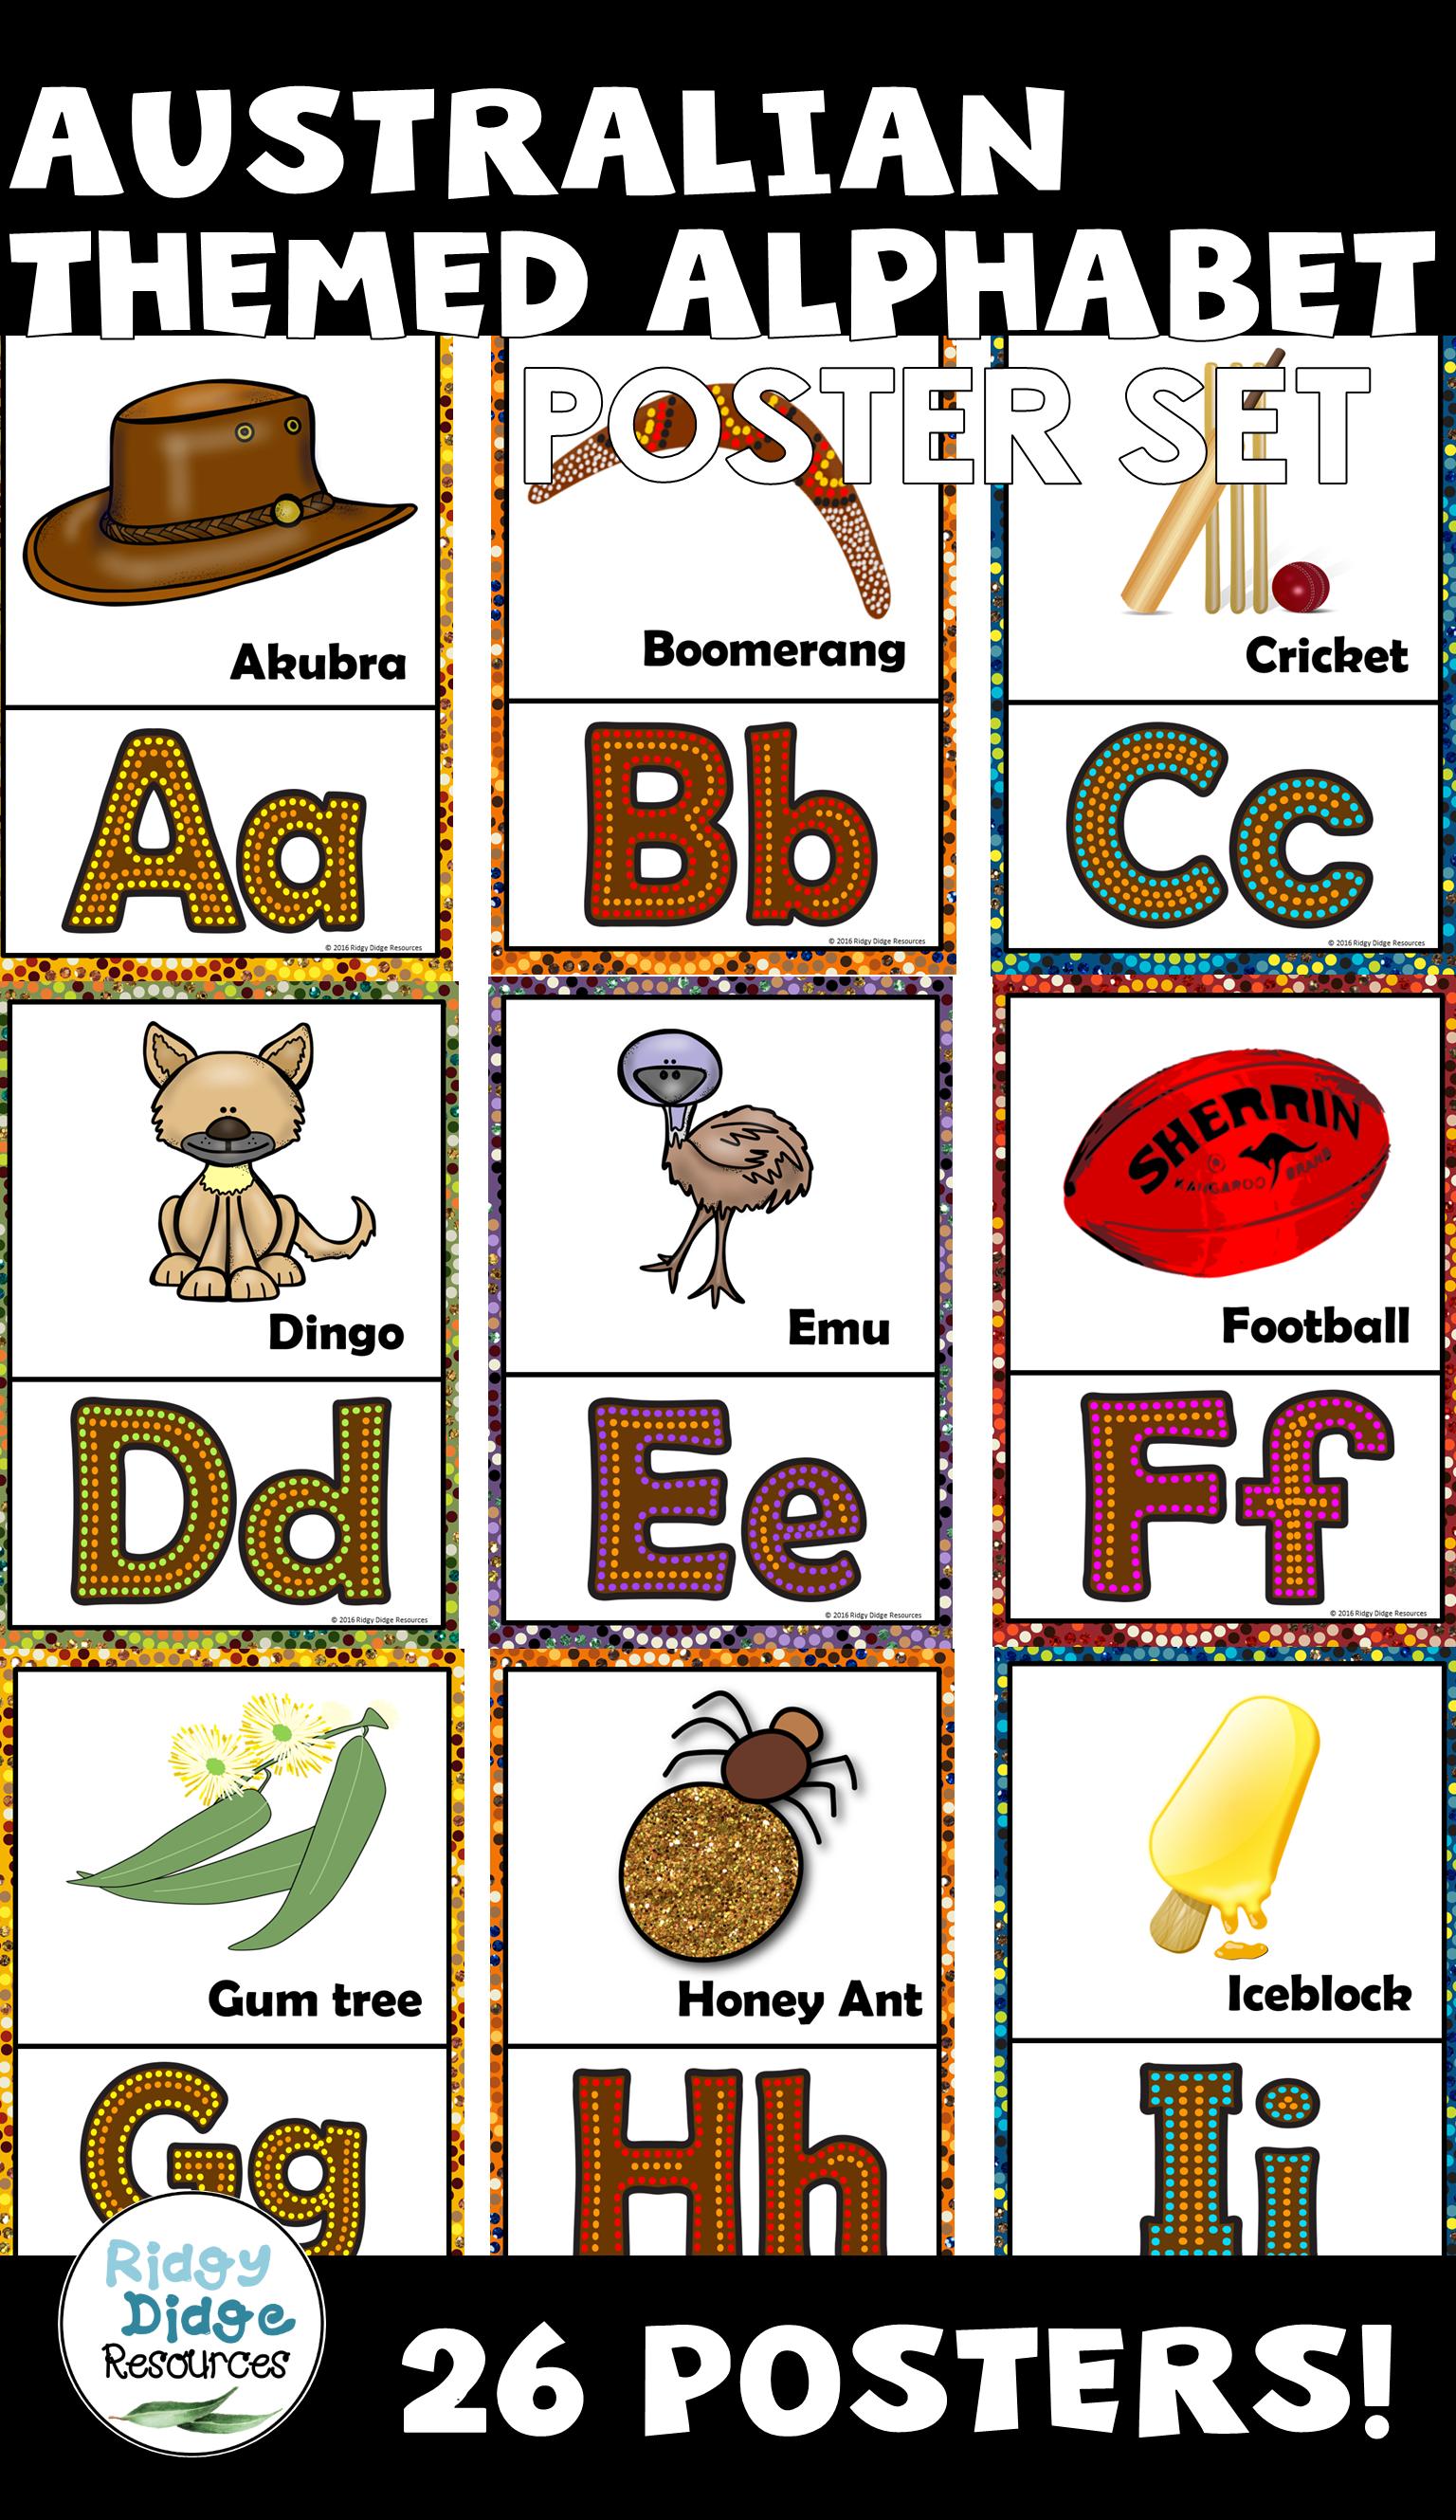 Australian Themed Alphabet Posters Alphabet Poster Alphabet Display Aboriginal Education